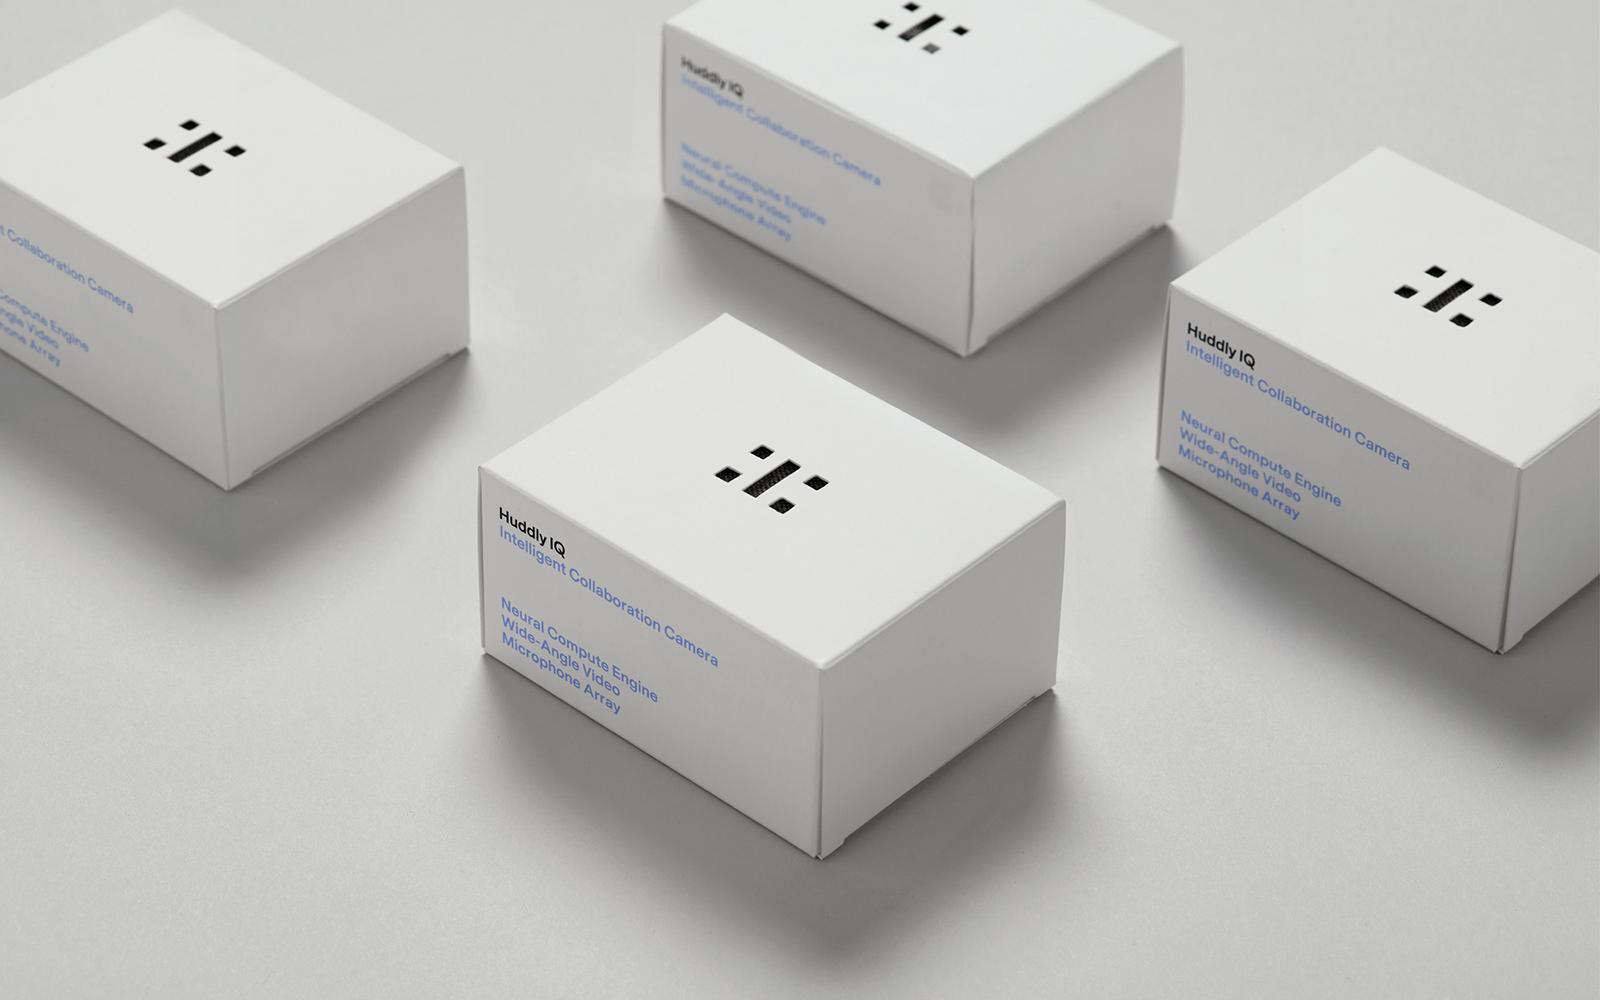 Huddy哈迪集团启用全新的品牌形象与VI系统设计-VI设计08